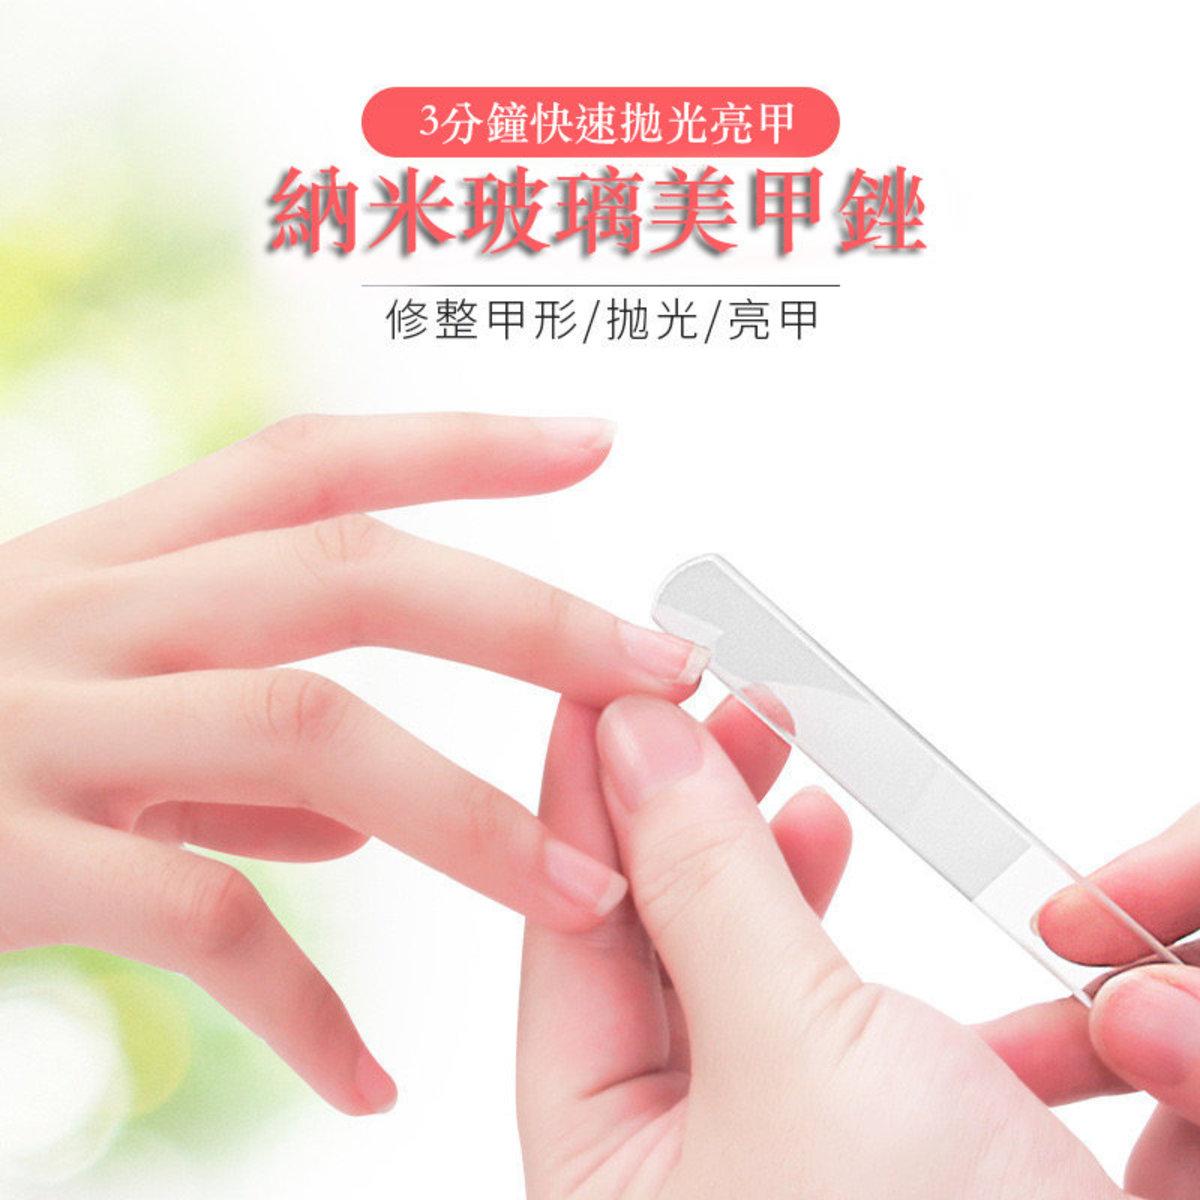 Polishing File Sanding Nail File Waxing Polishing Nail Tool